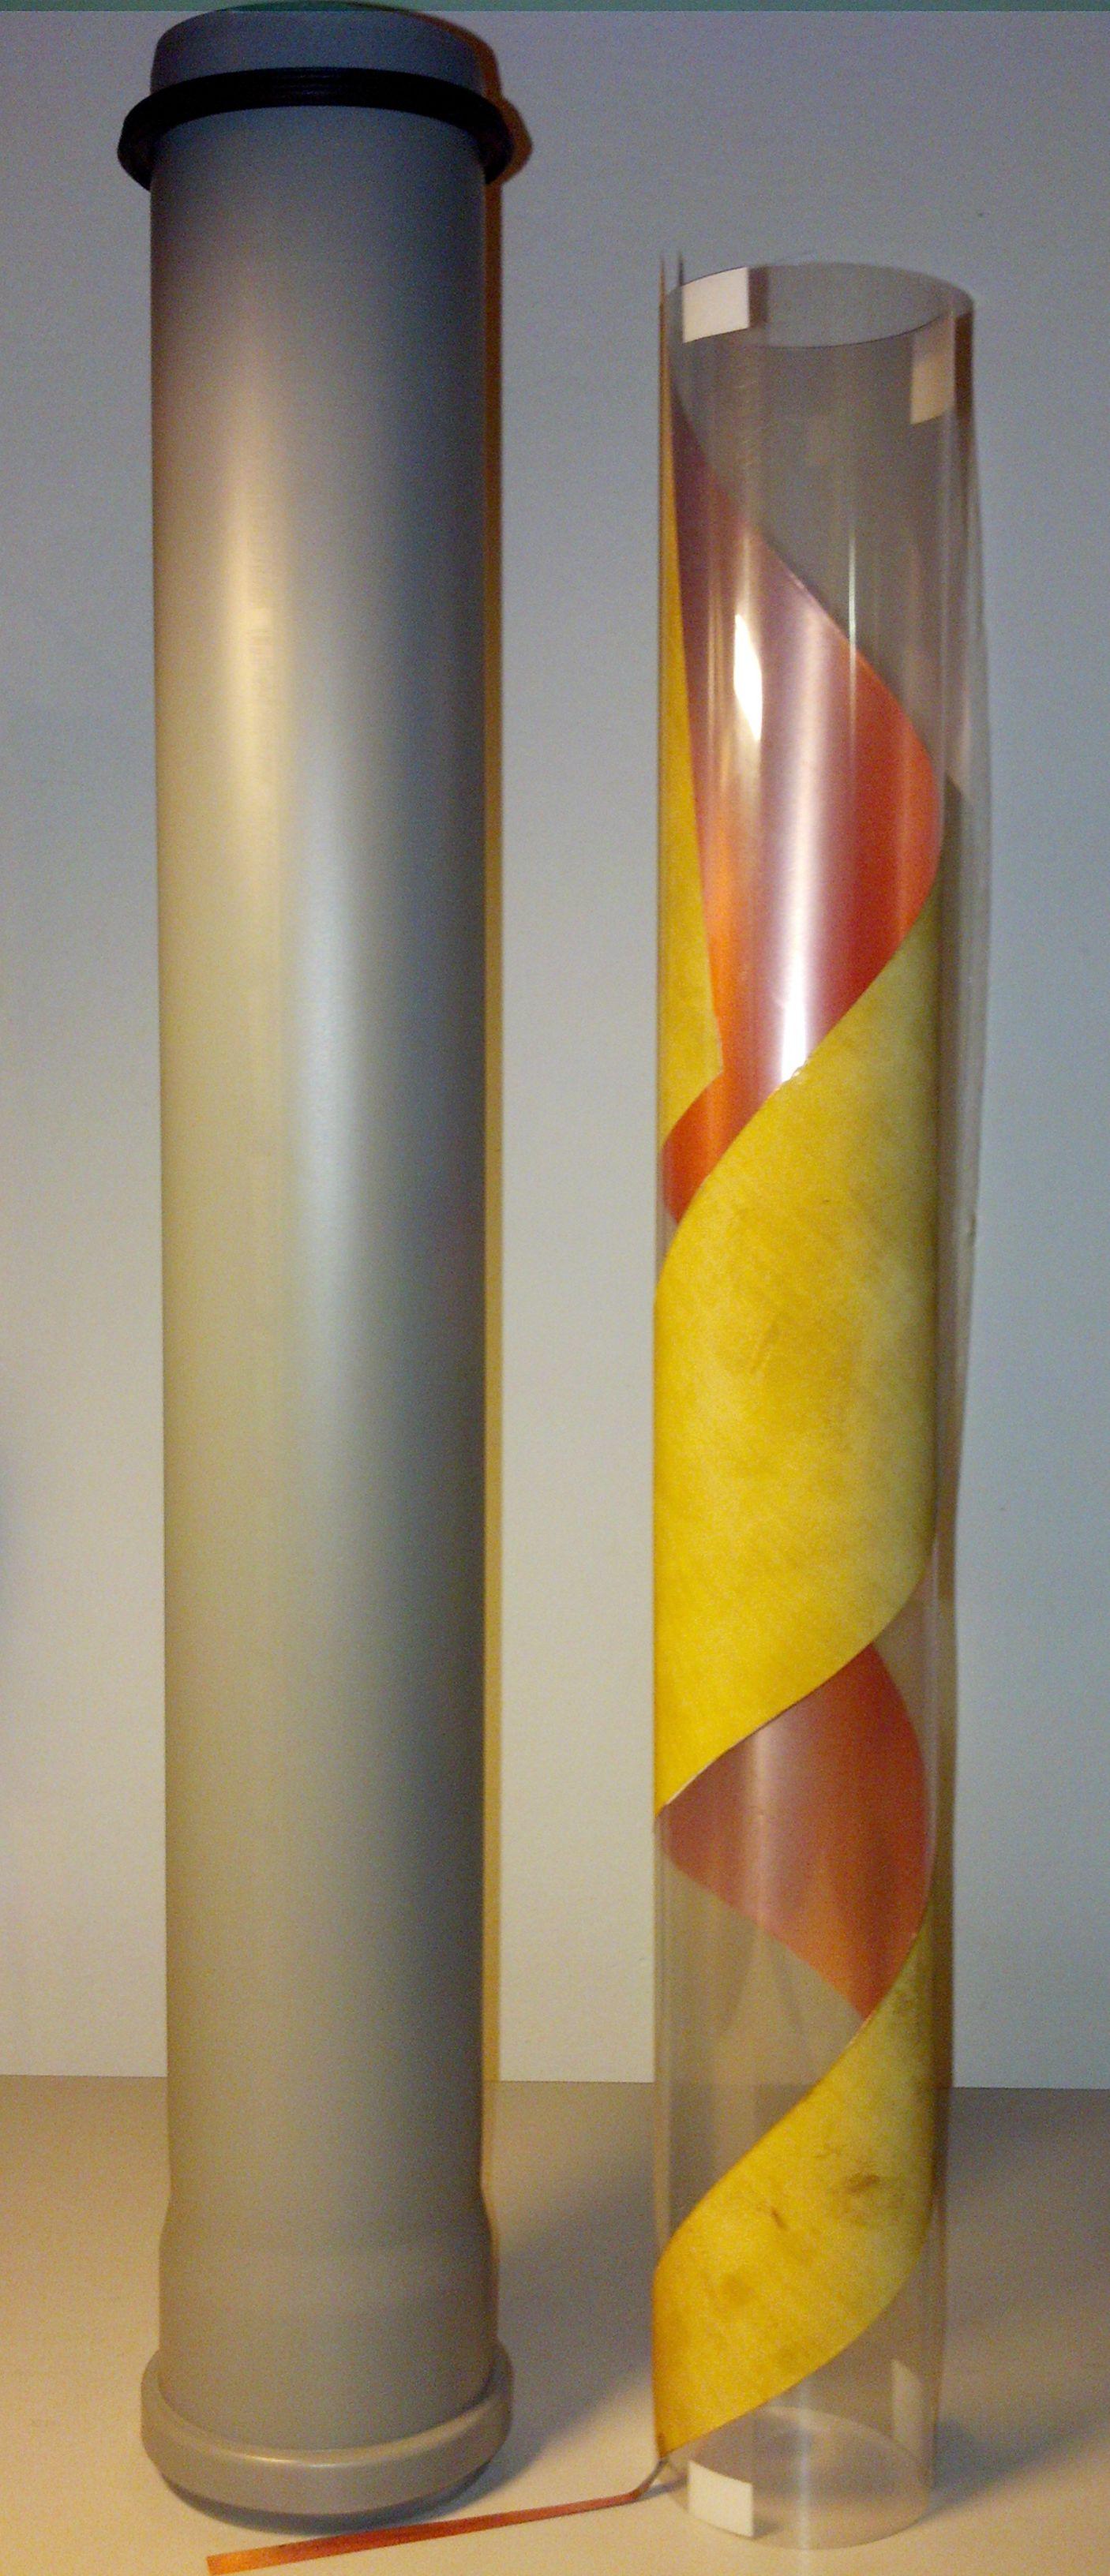 A2000 - Antenna element + tube